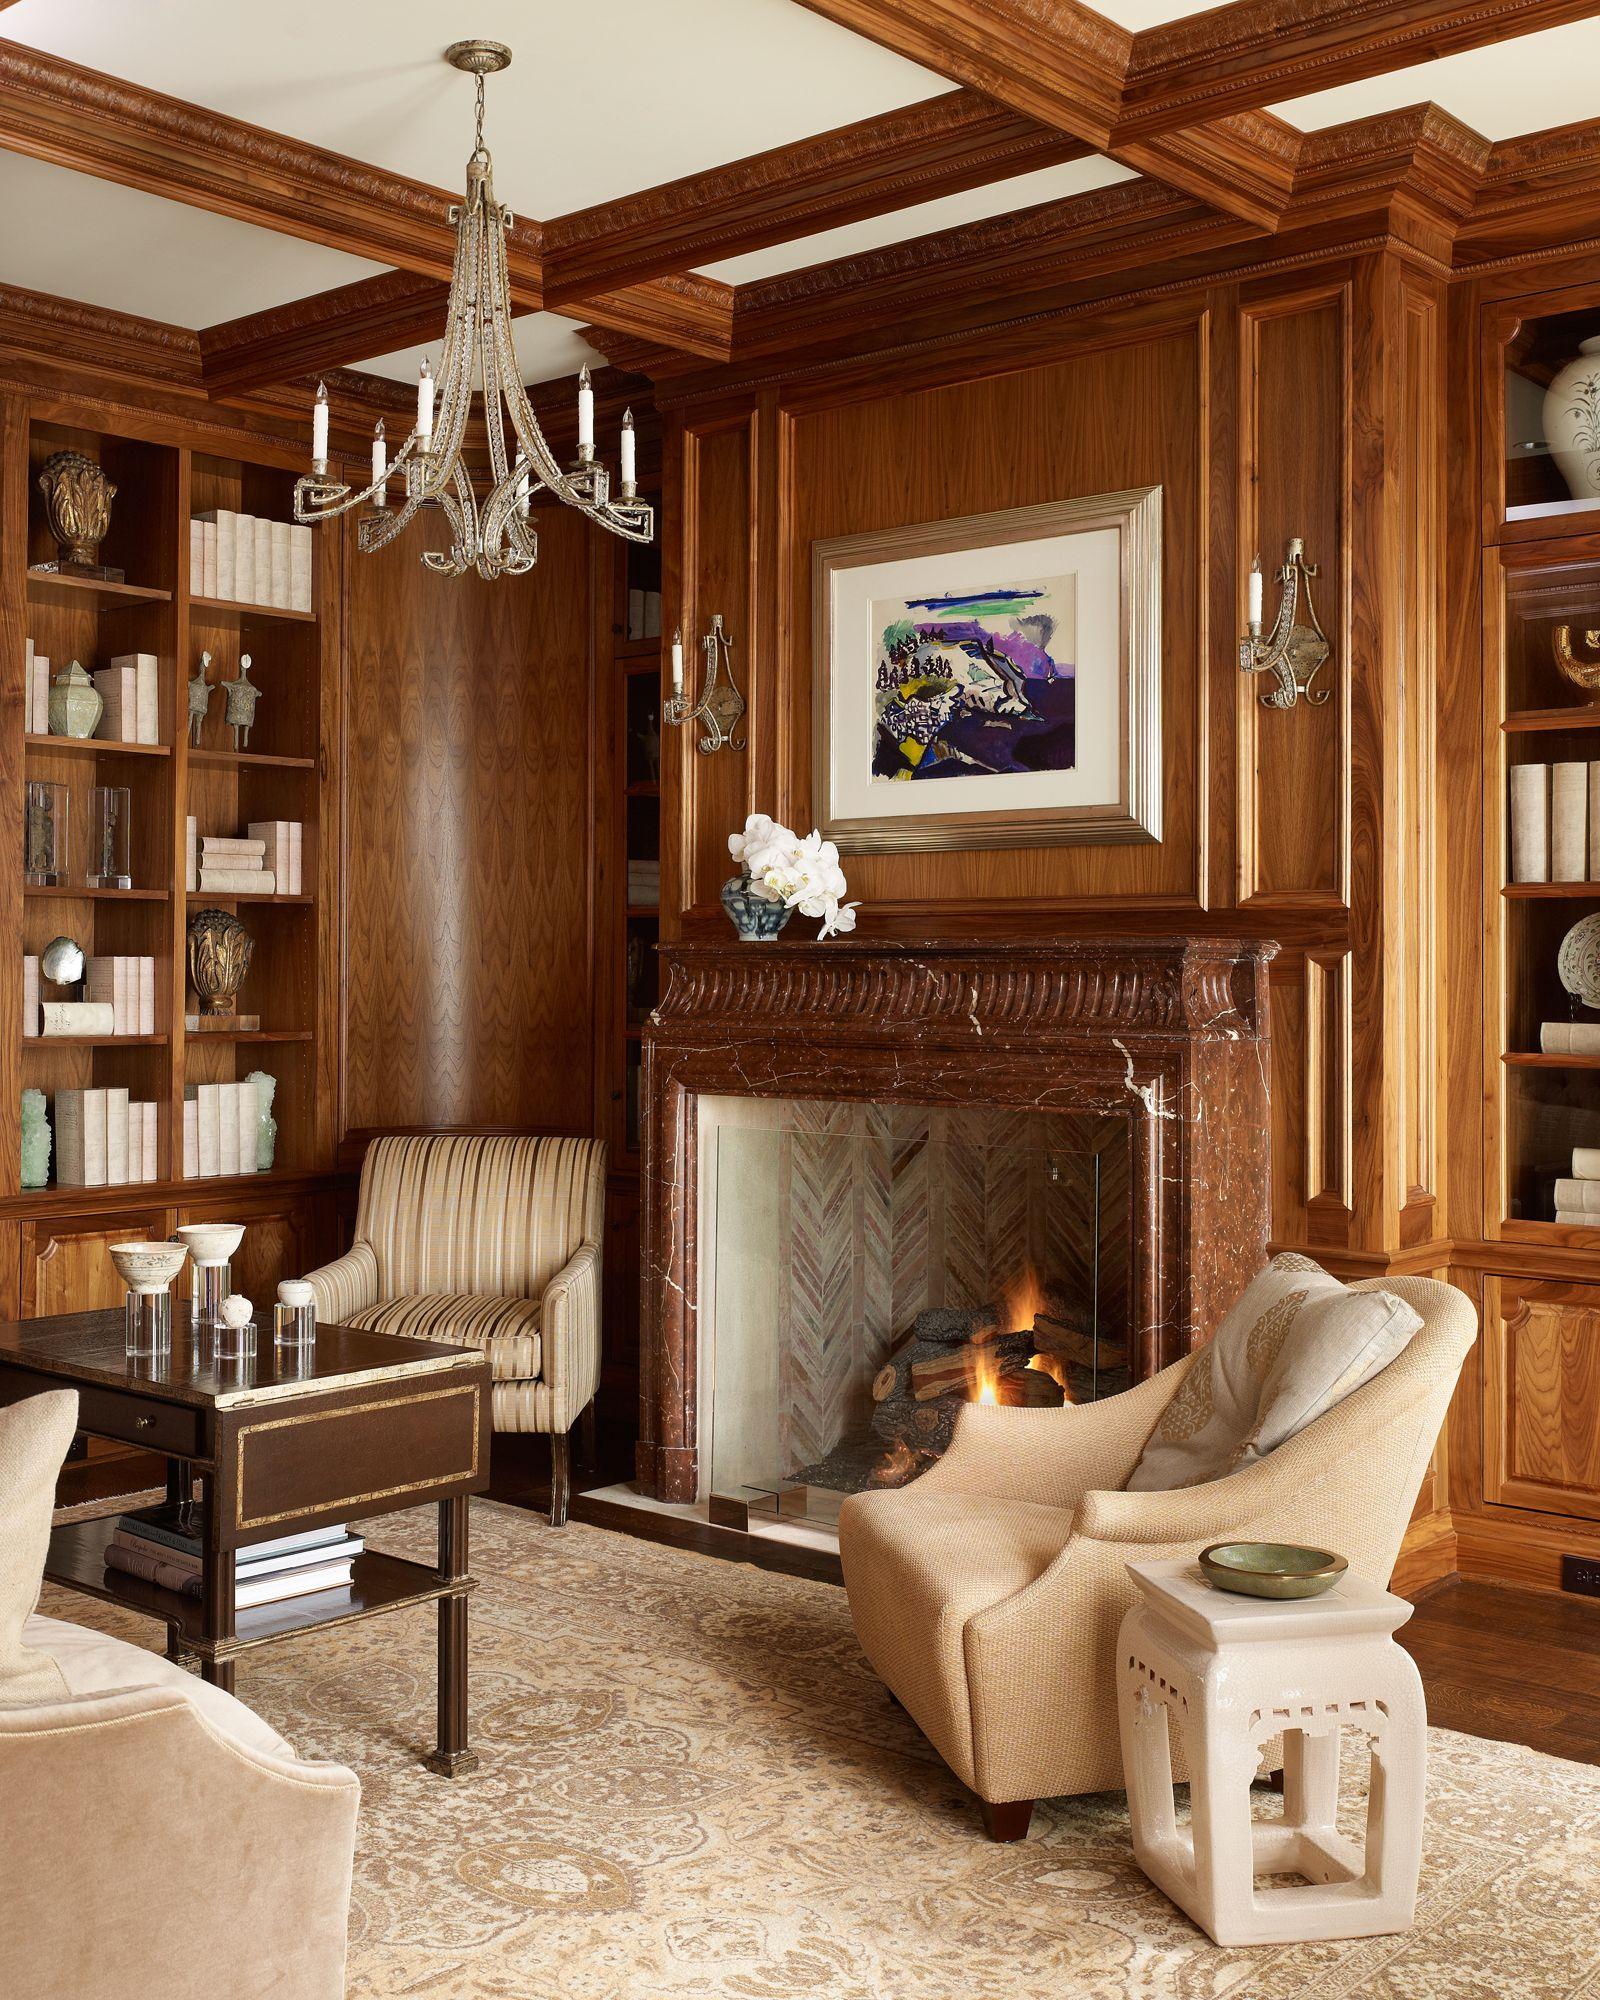 Fireplace Laura Lee Clark Interior Design Inc Home Pinterest